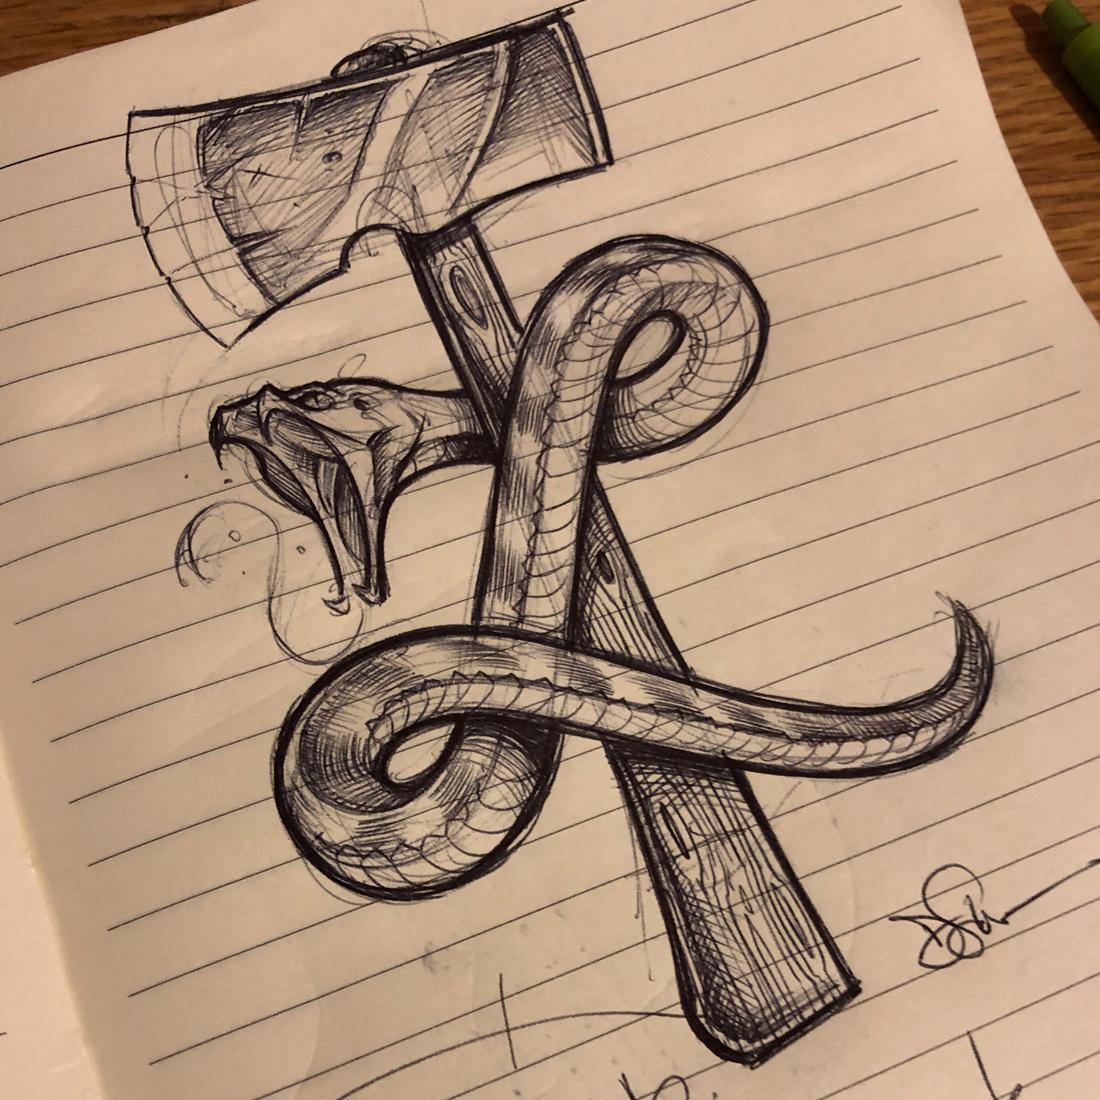 KeepSearchin_blog_52.jpg